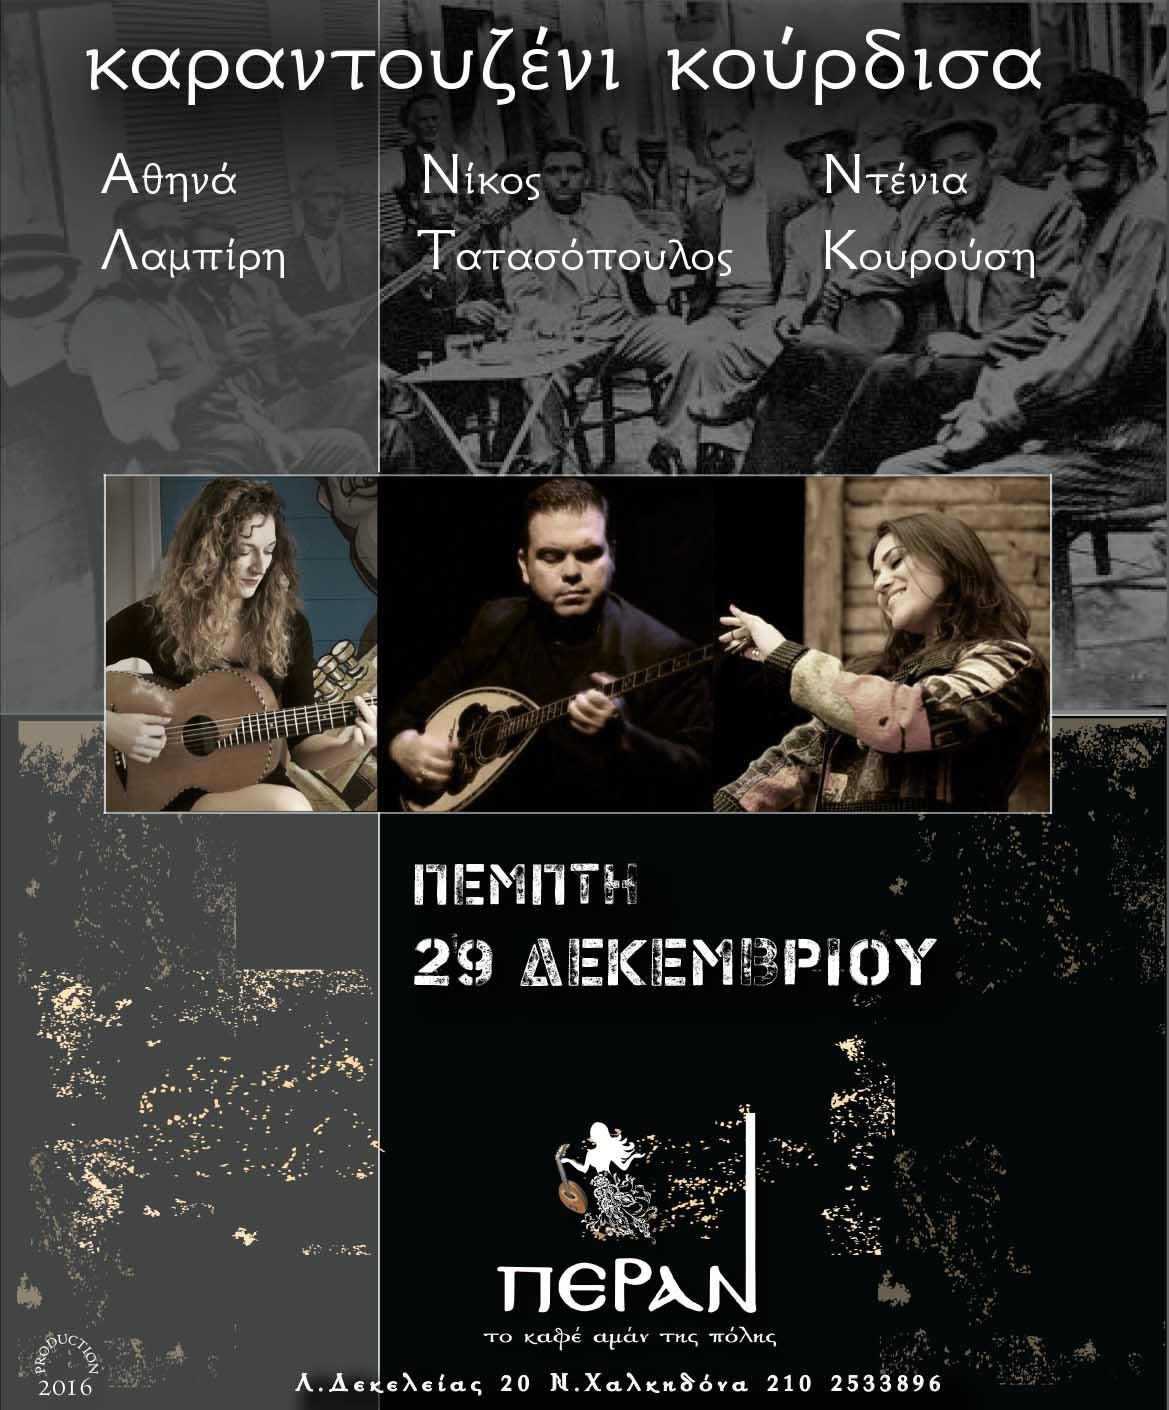 TATASOPOYLOS-KOYROYSI 29-12